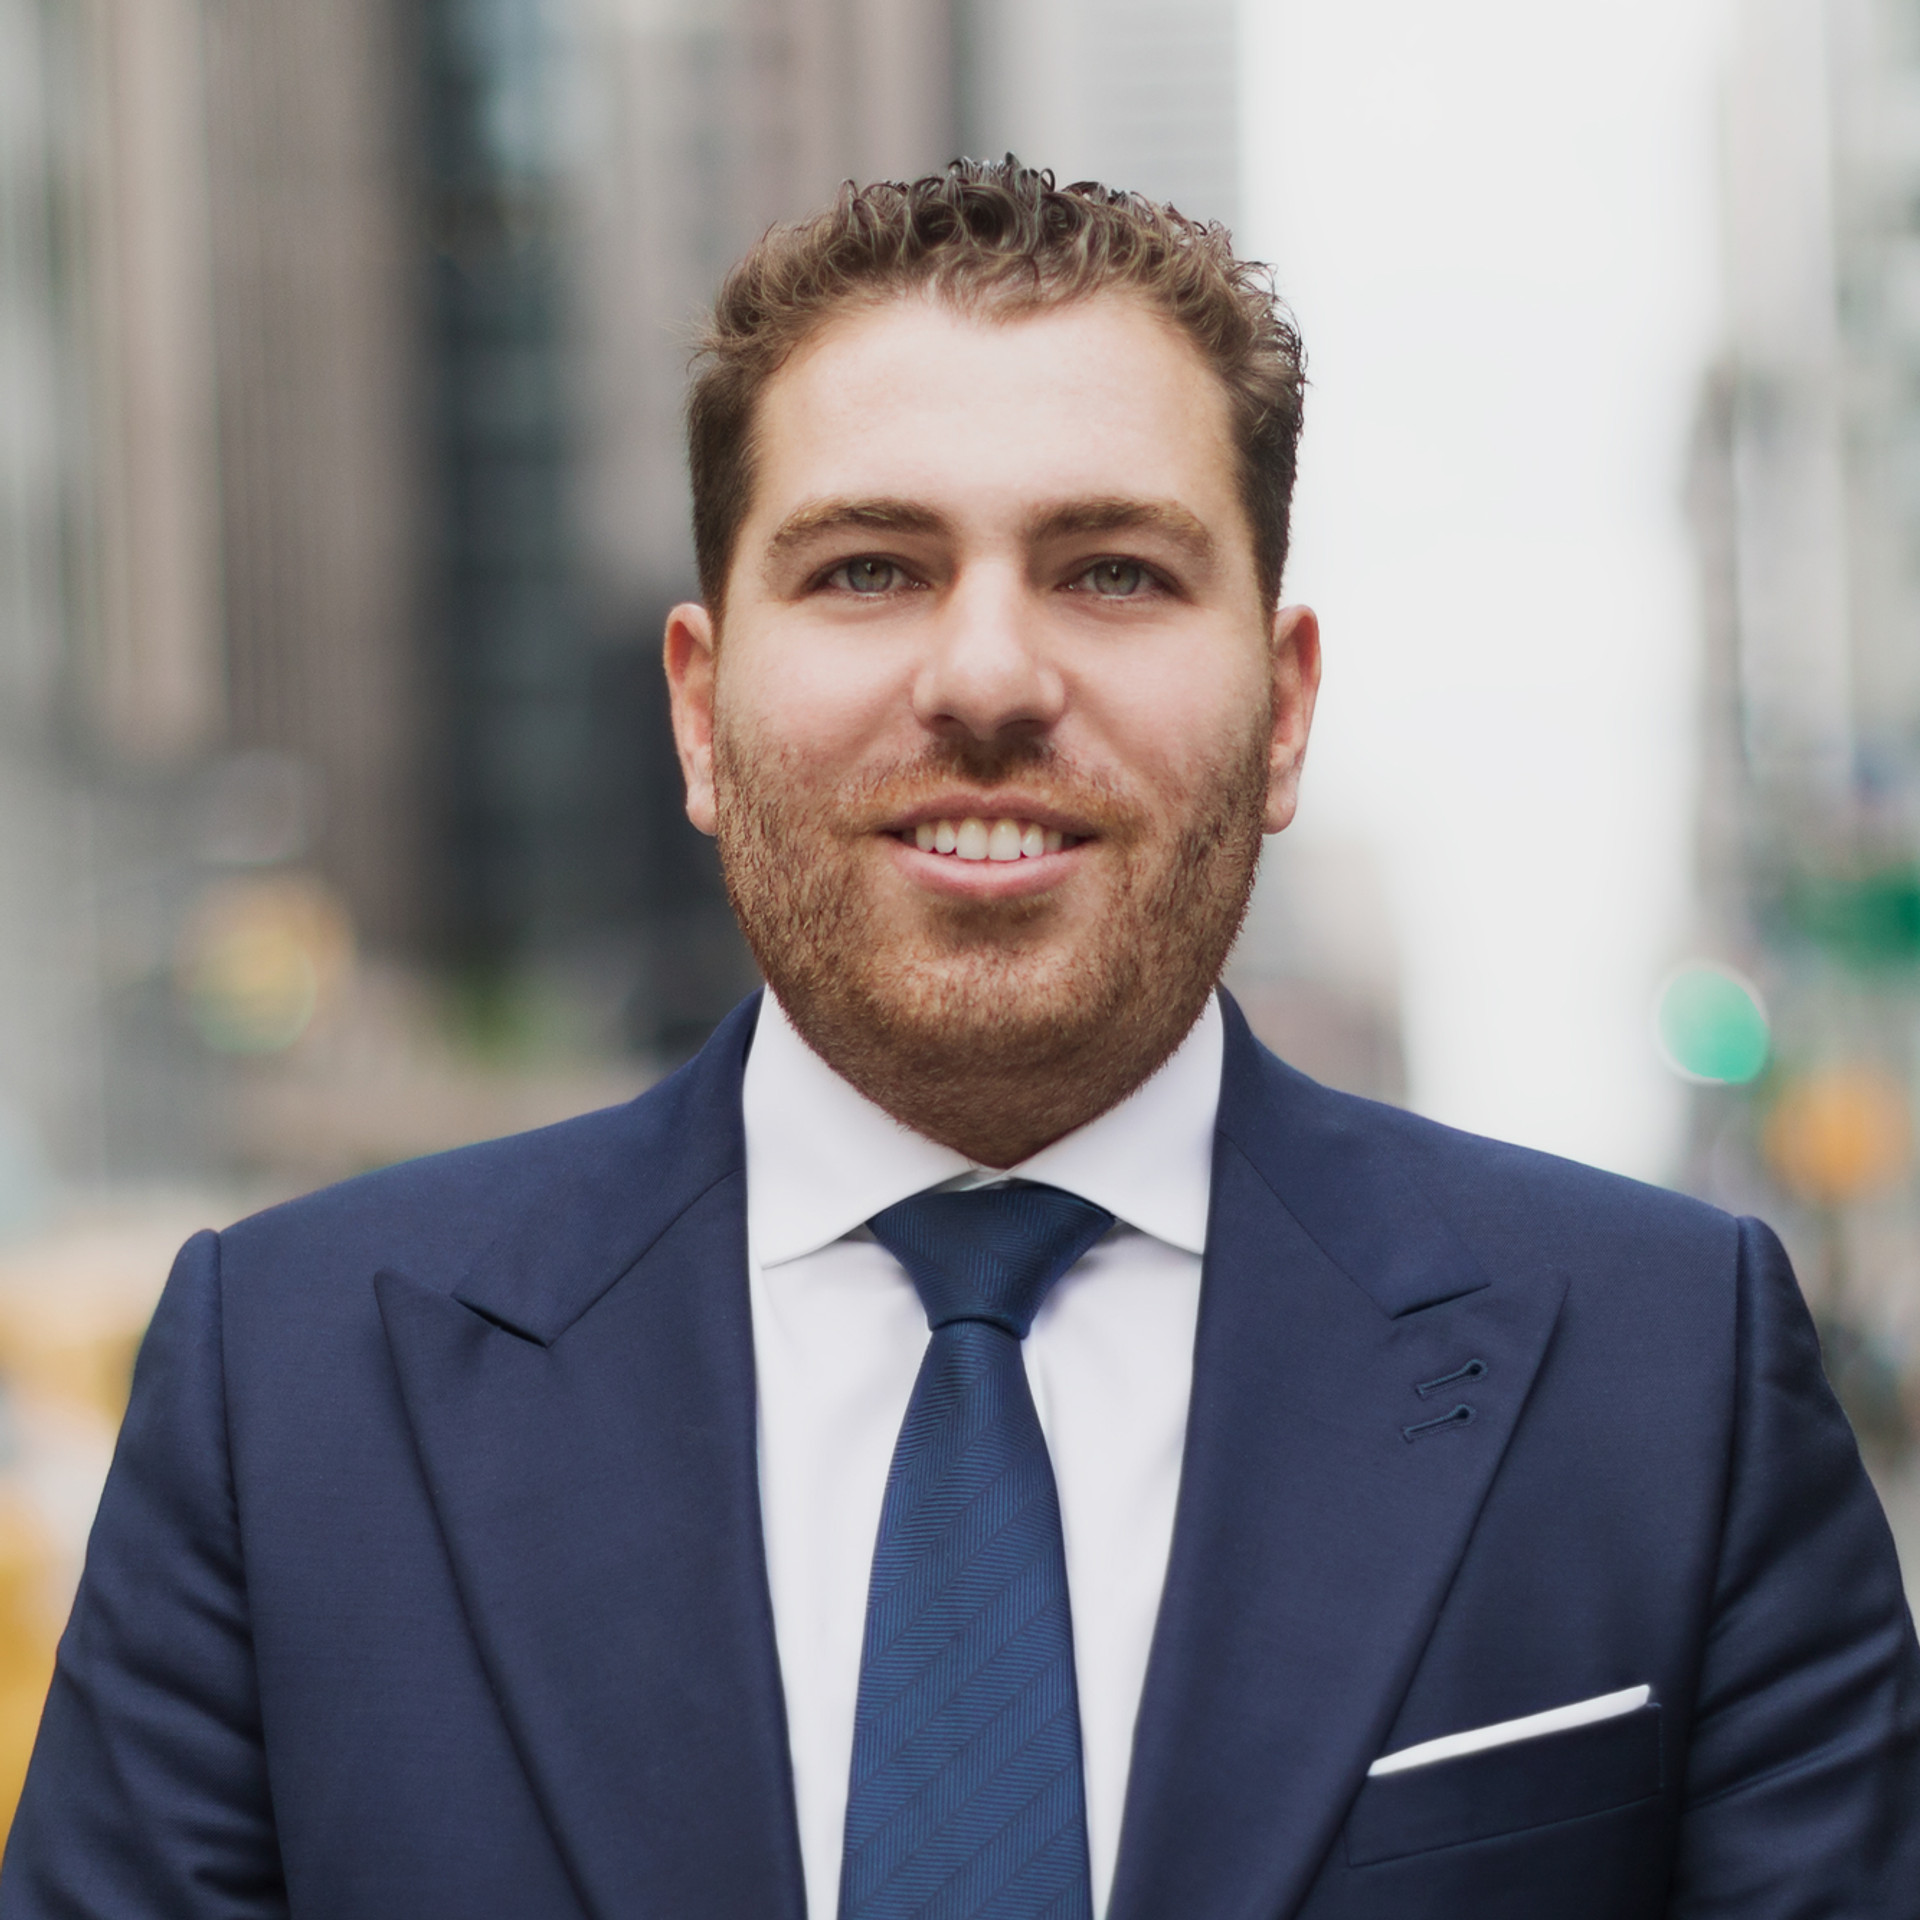 Michael Hakimian